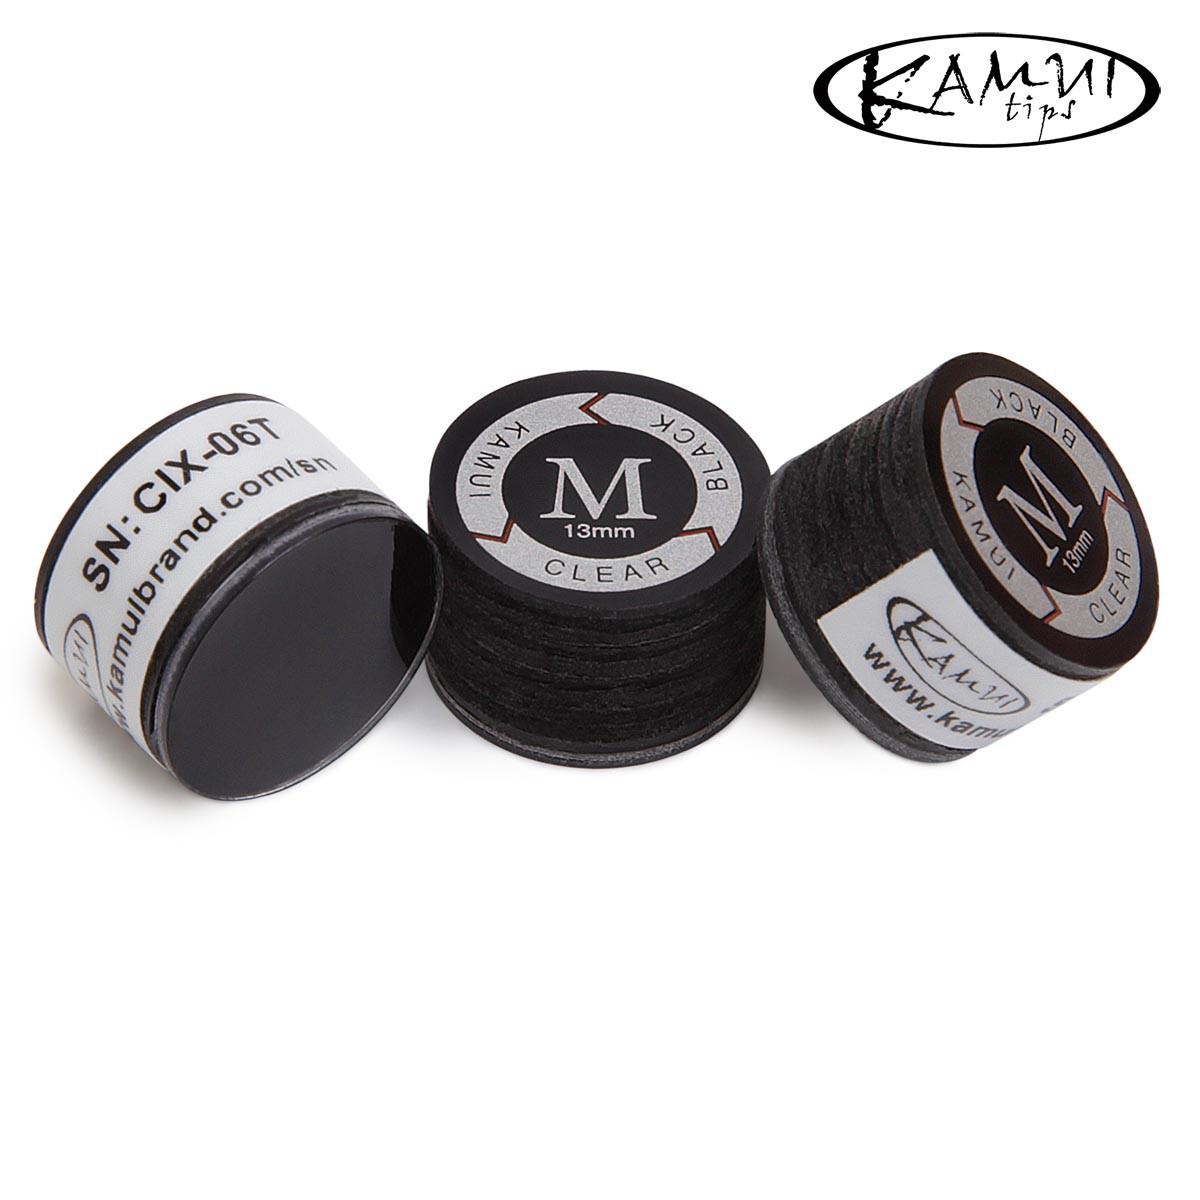 Наклейка для кия Kamui Clear Black ø13мм Medium 1шт.